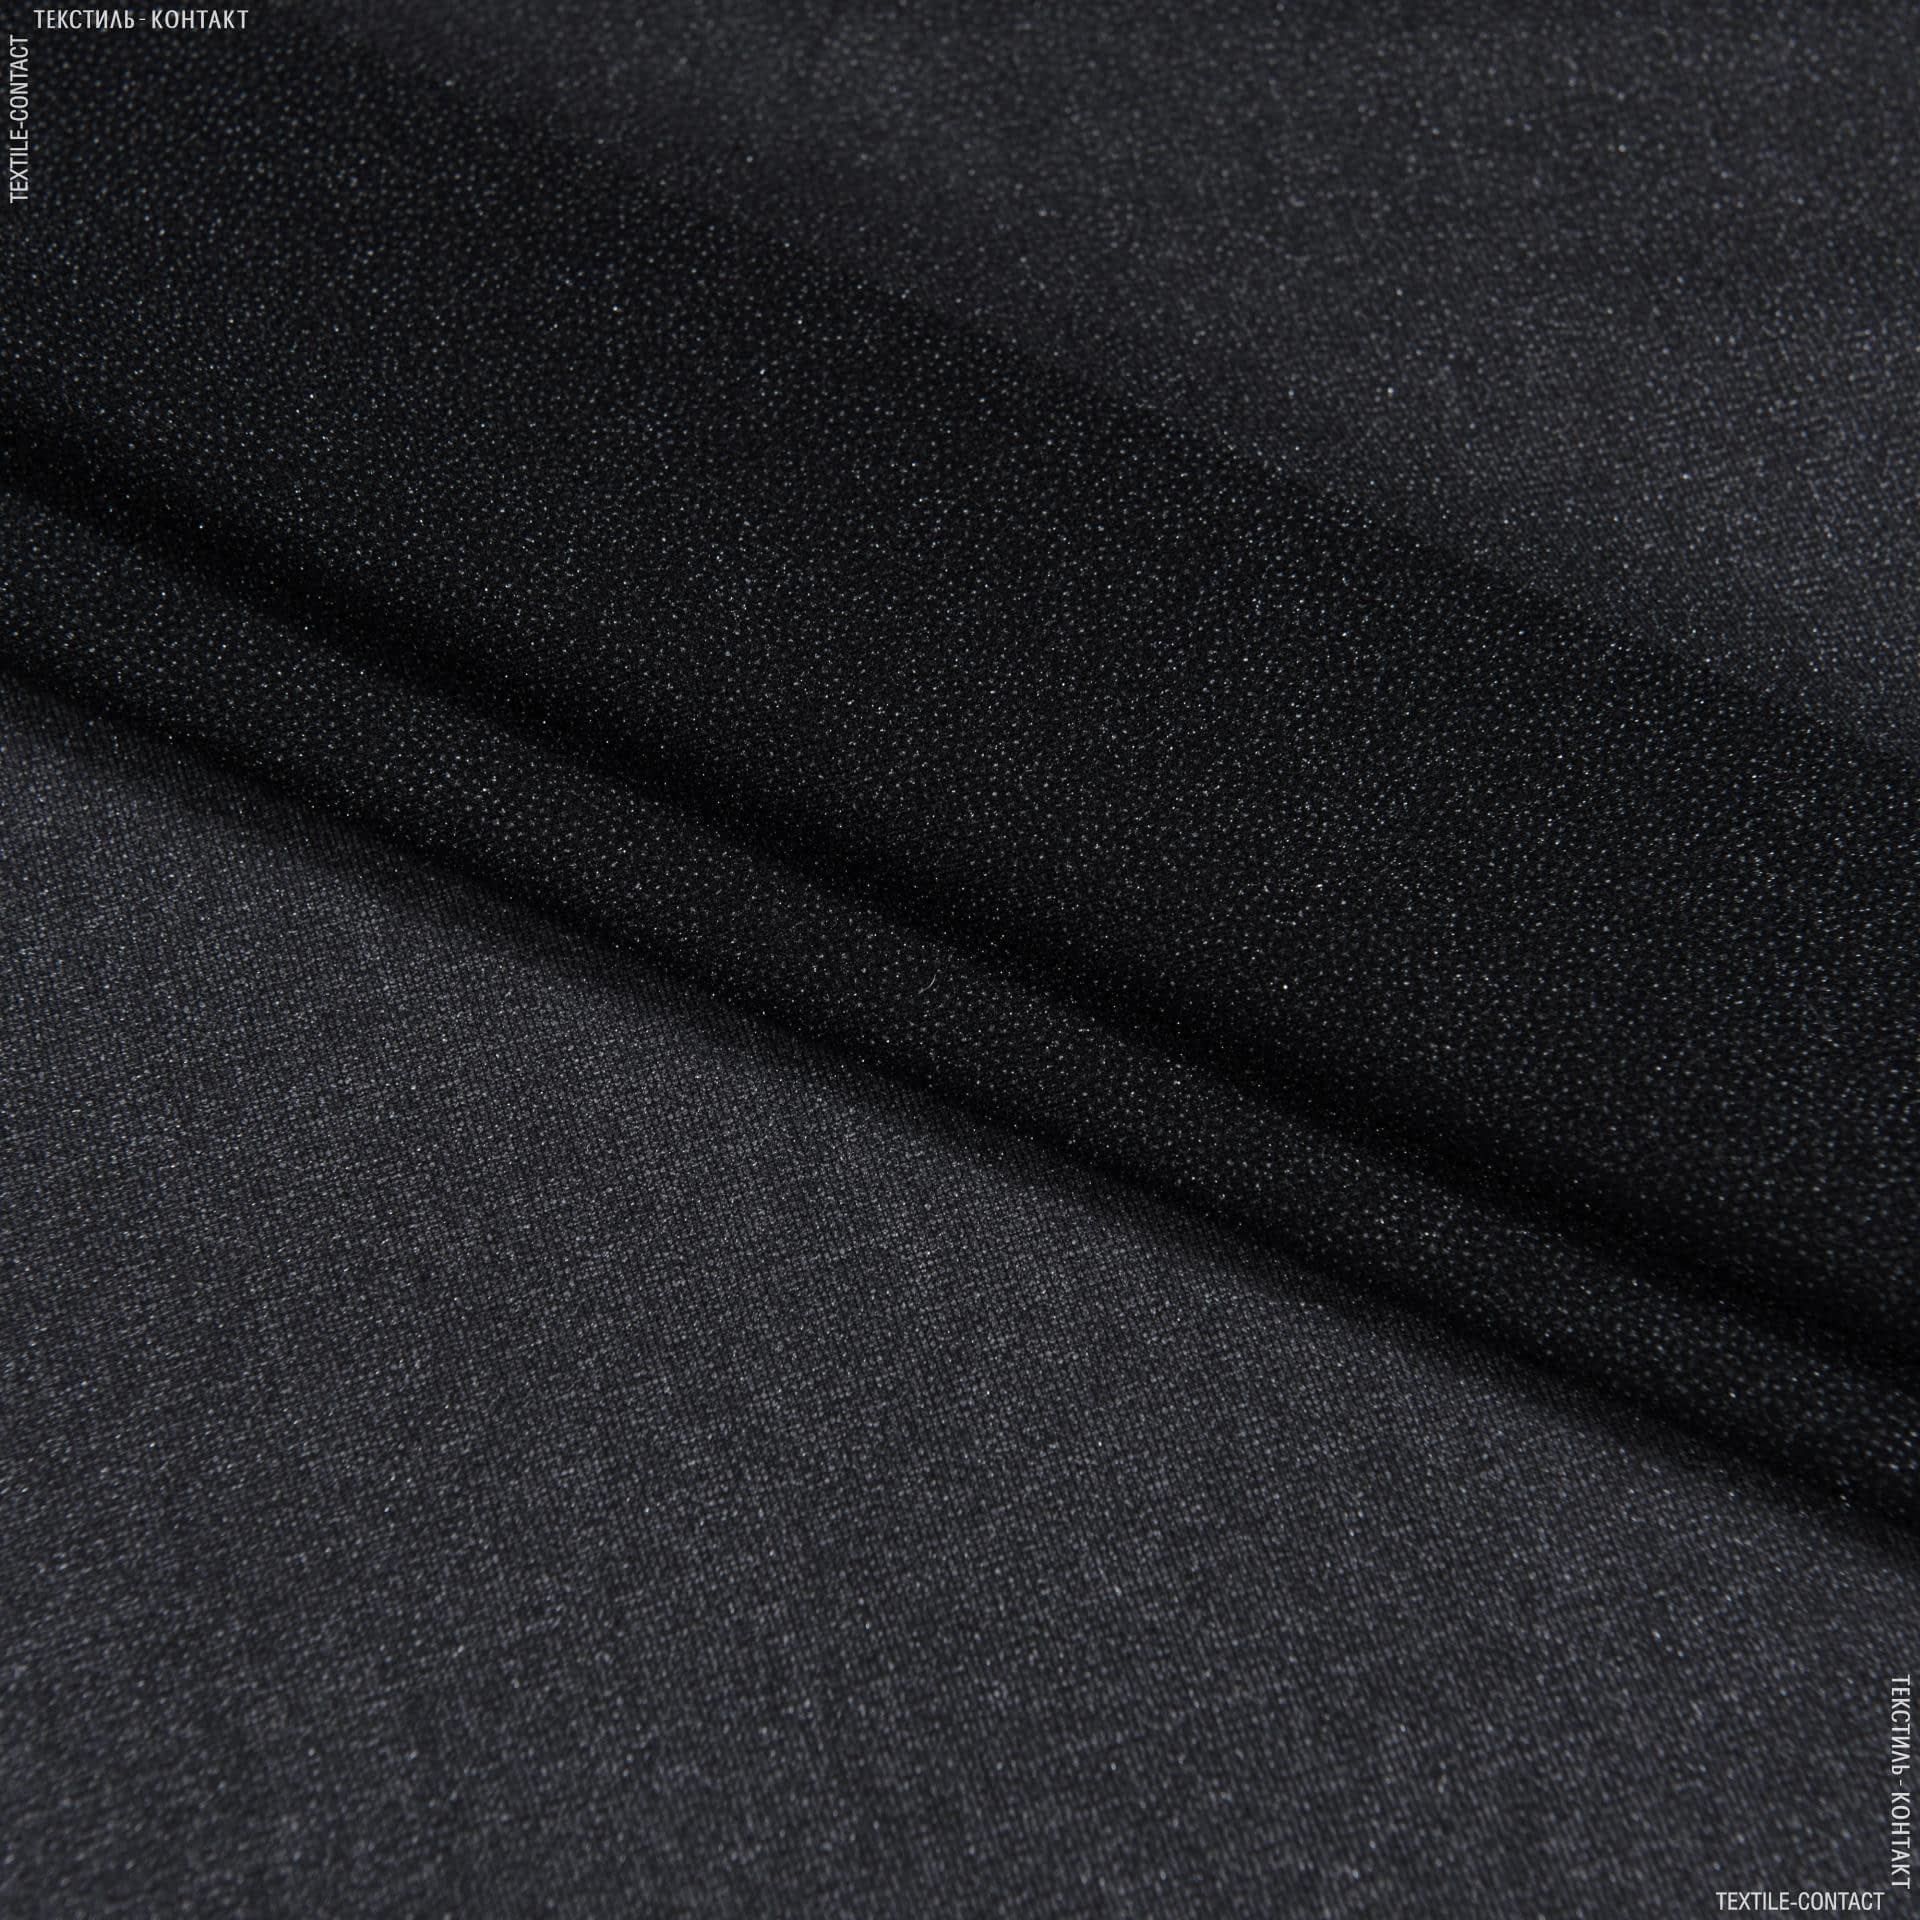 Ткани дублирин, флизелин - Дублирин стрейч 40г/м черный